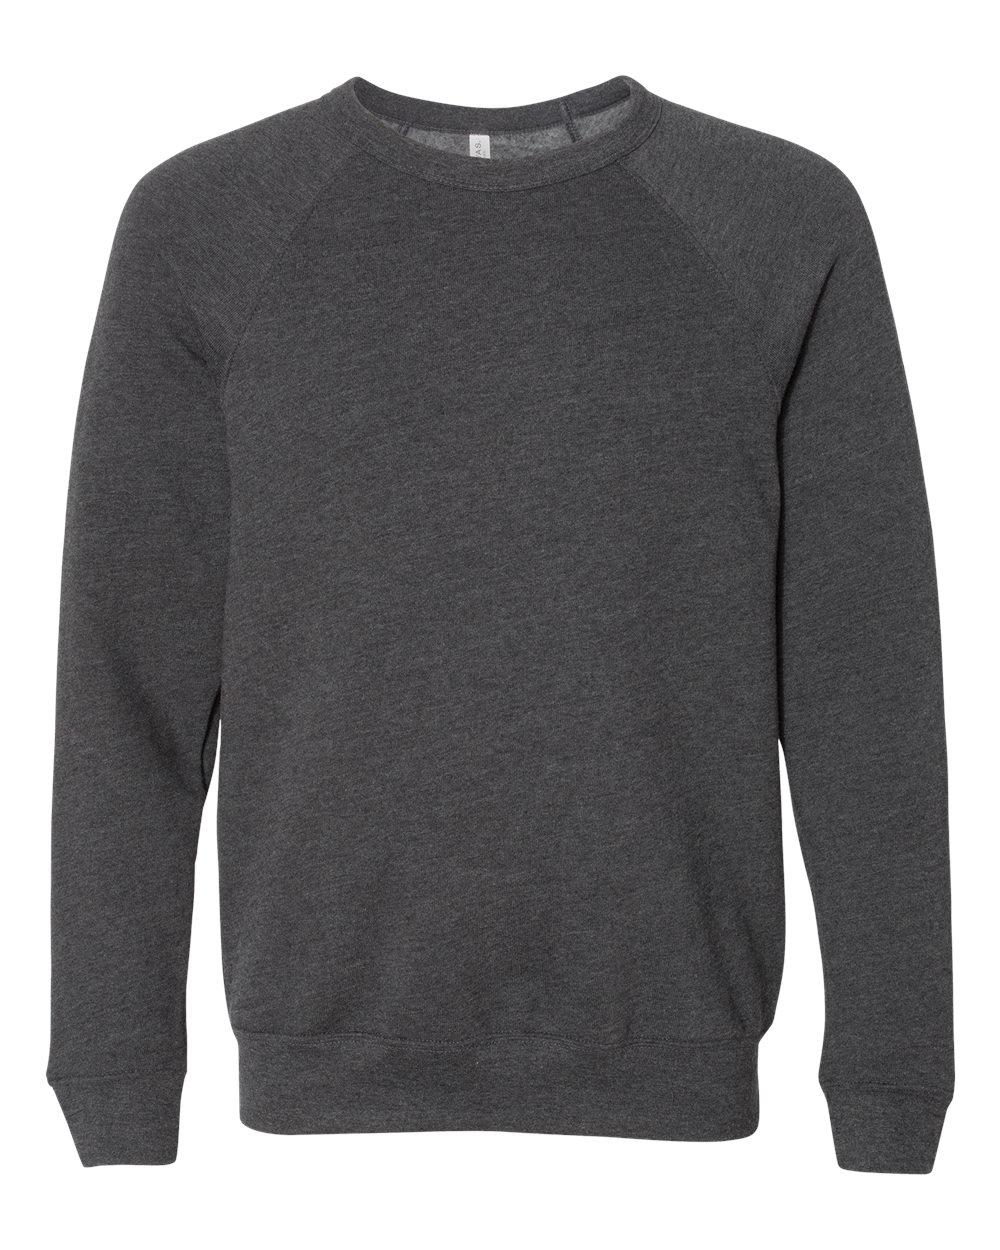 Bella-Canvas-Unisex-Sponge-Fleece-Crewneck-Sweatshirt-Top-Blank-3901-up-to-2XL thumbnail 21